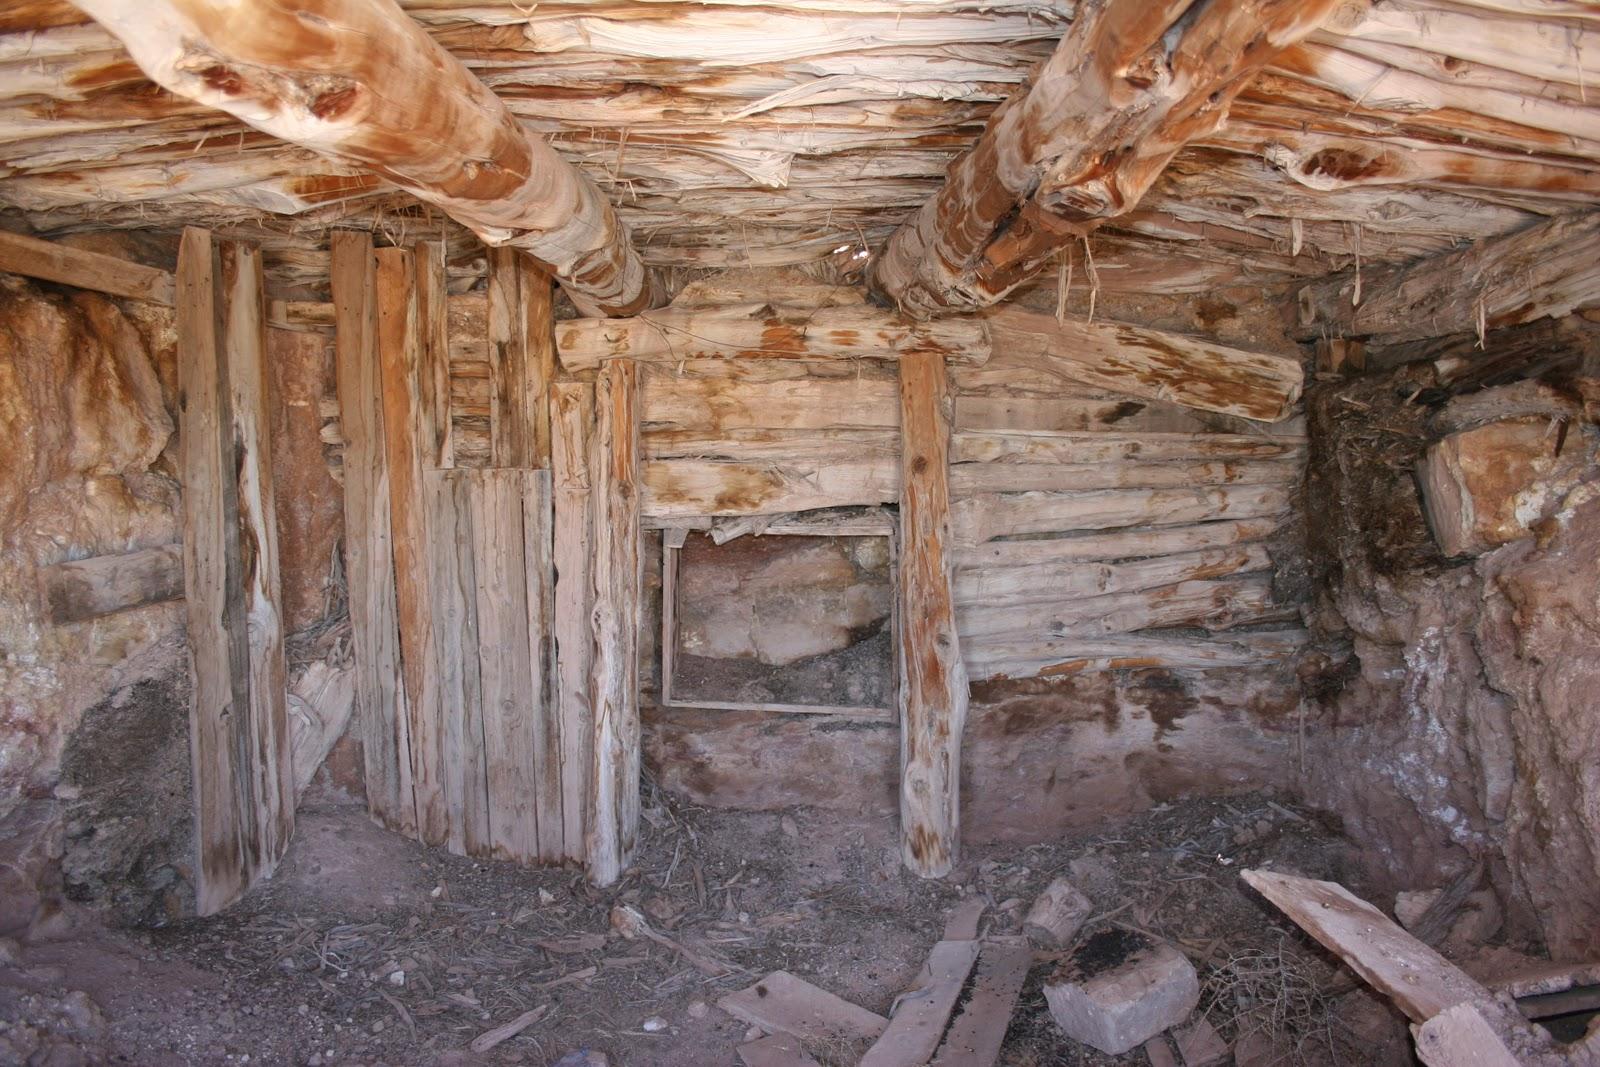 Southwest Explorations Primitive Earth Shelter